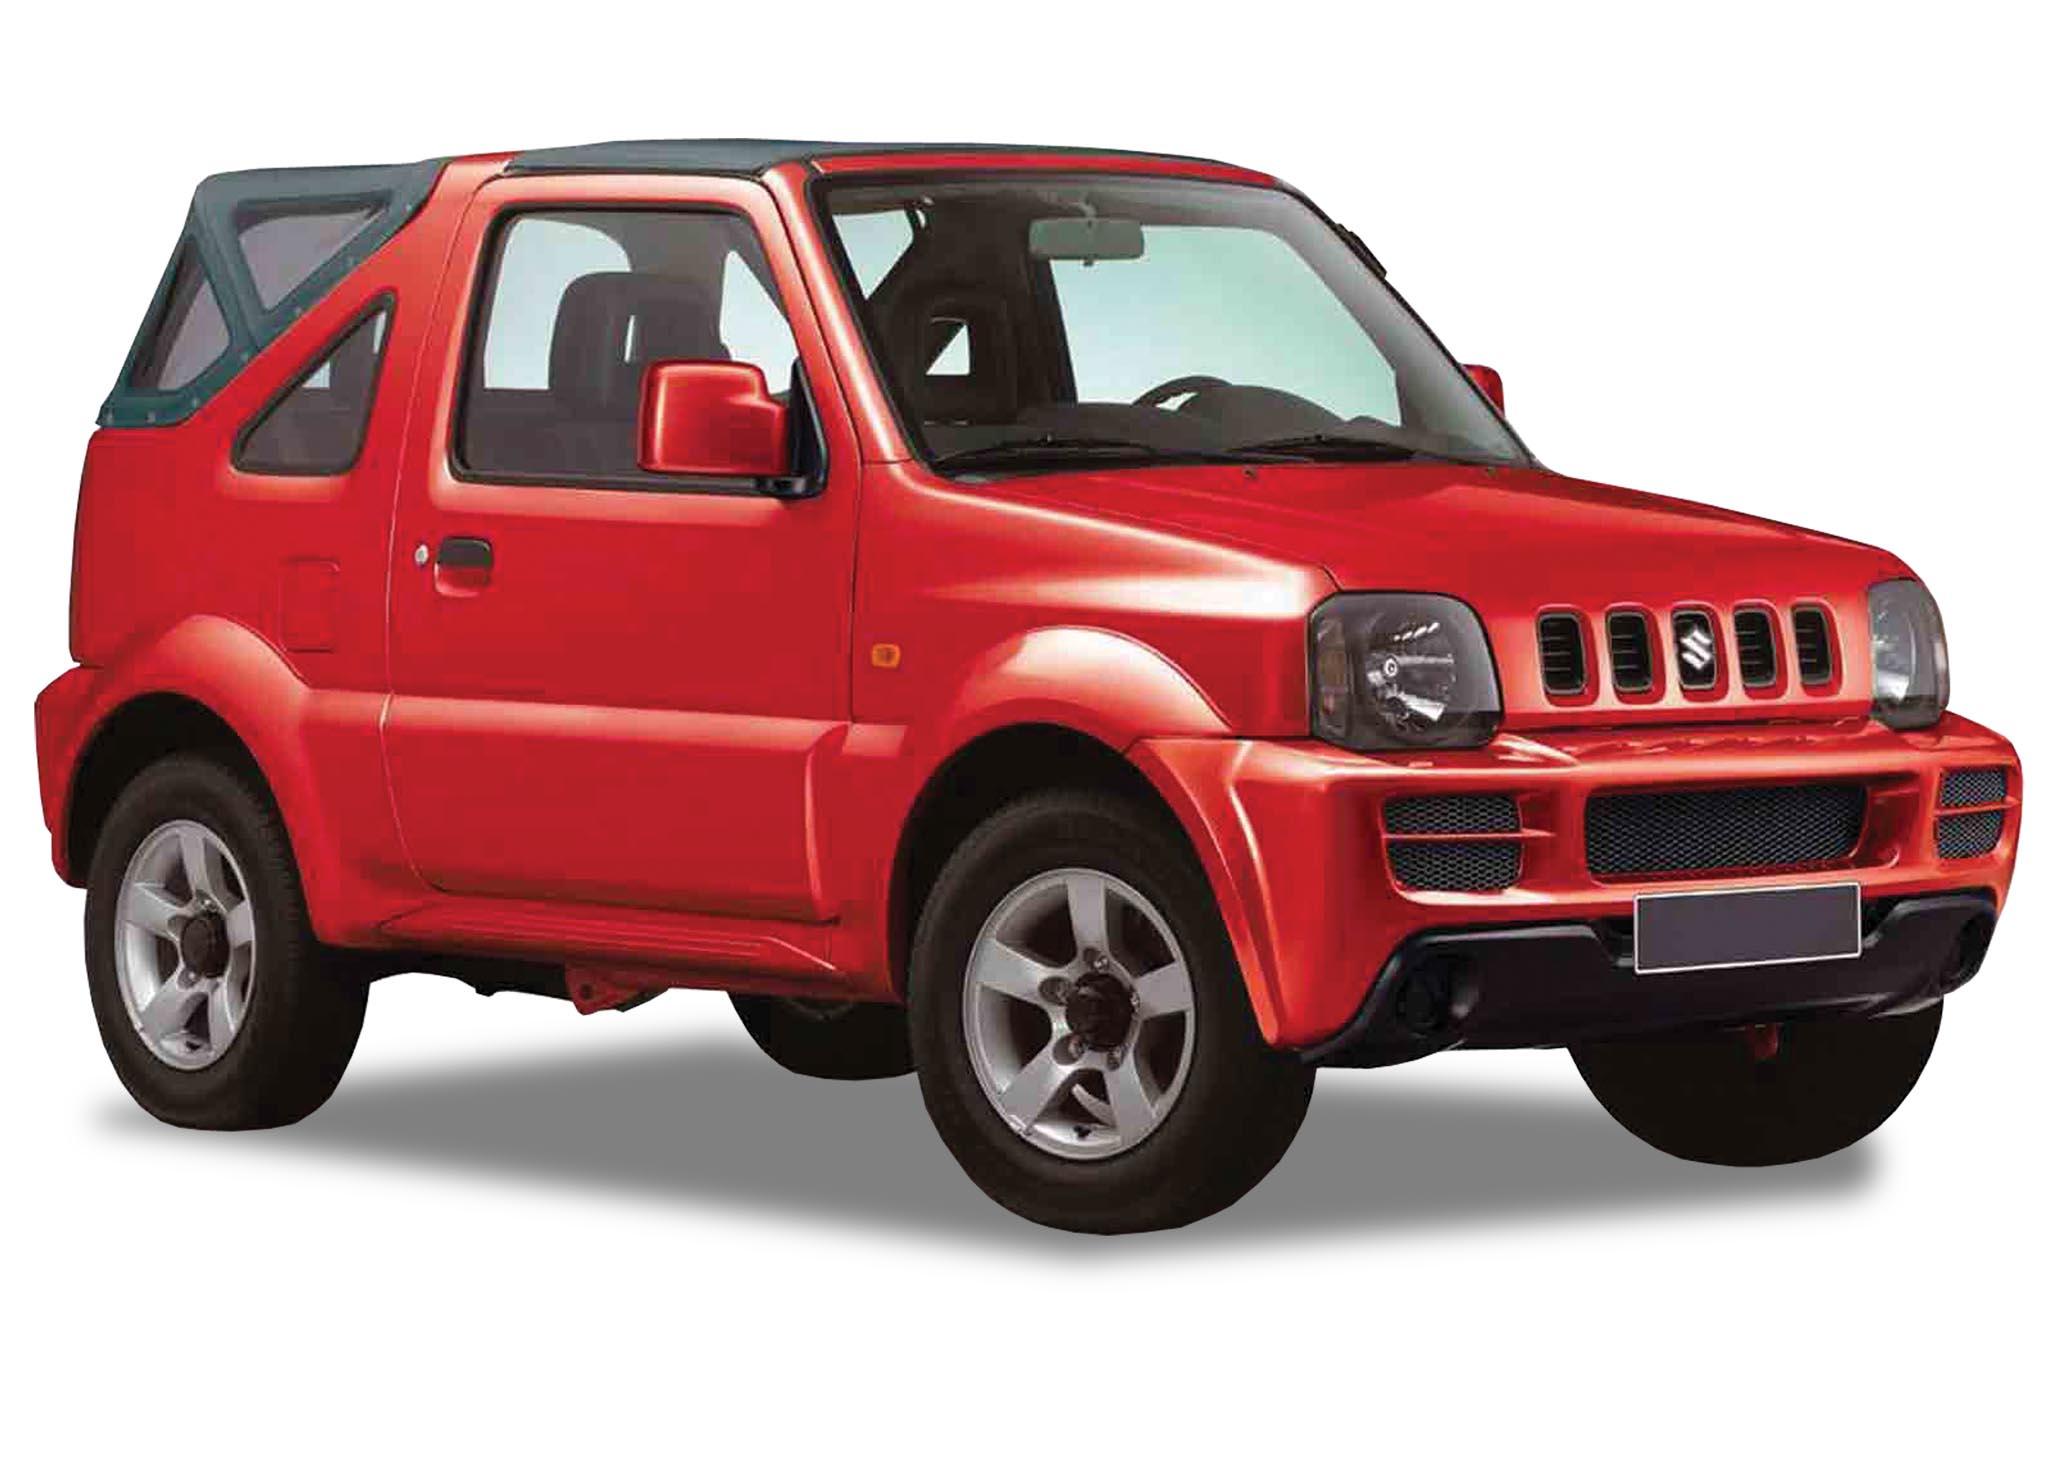 suzuki jimmy jeep 4x4 eos travel. Black Bedroom Furniture Sets. Home Design Ideas